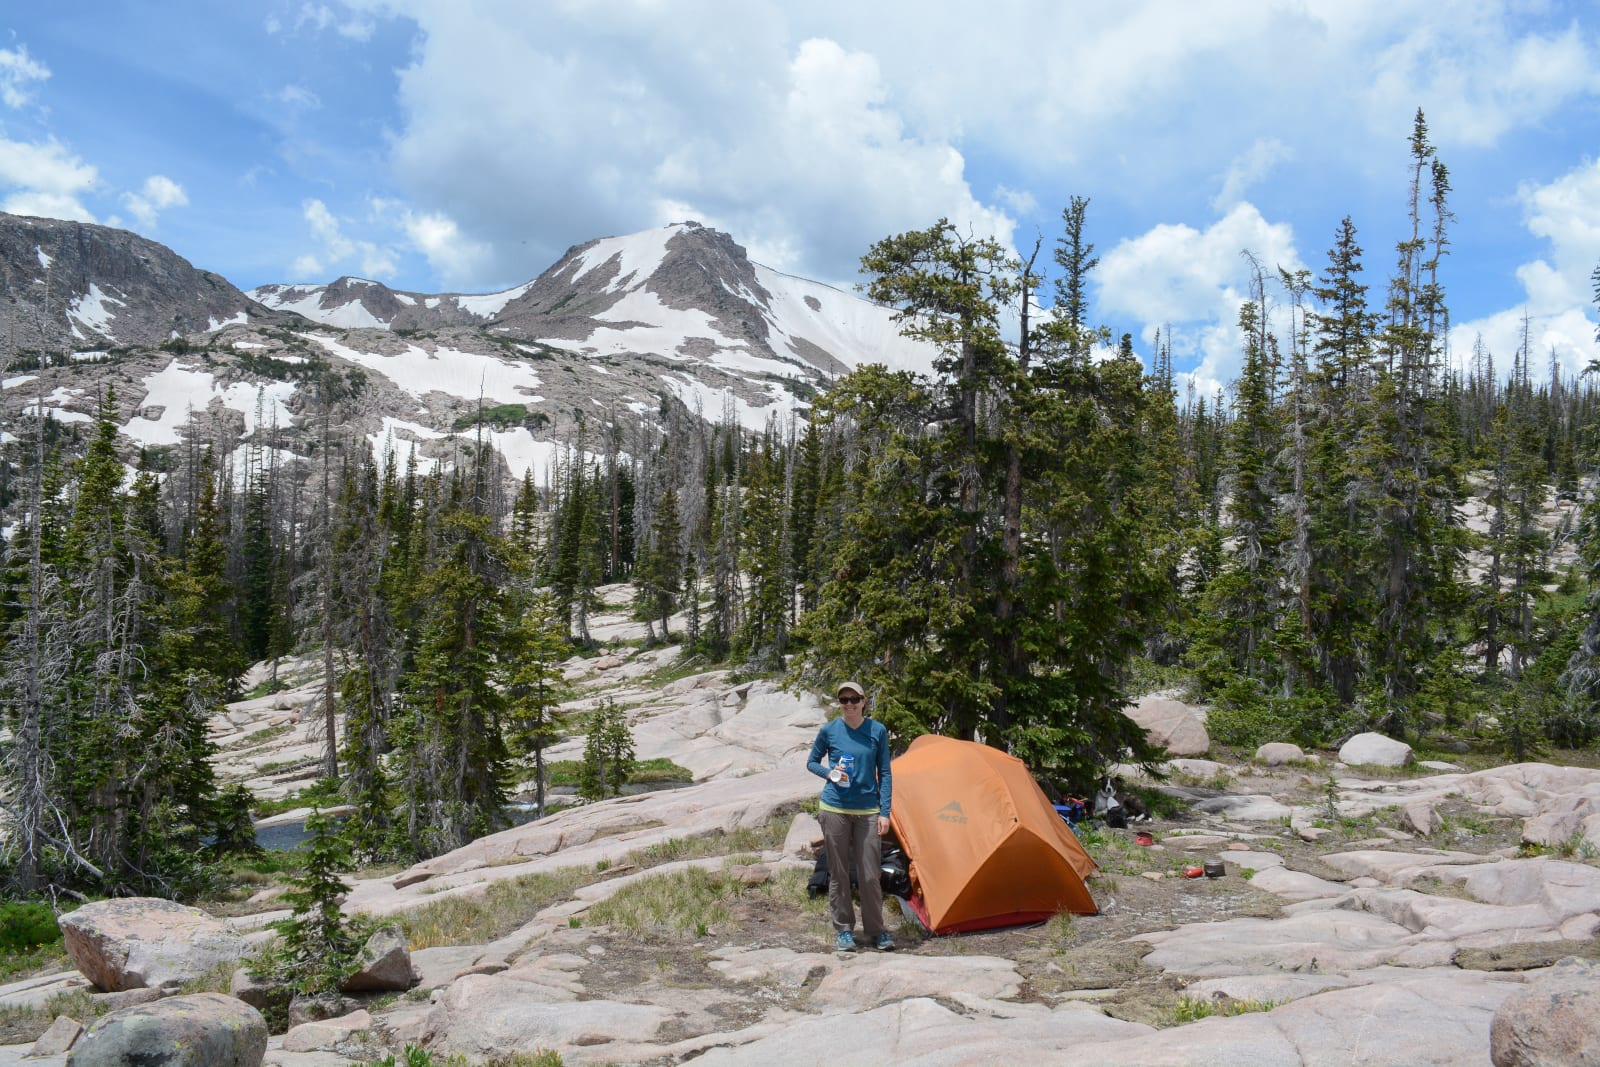 Mount Zirkel Wilderness Backpacking Tent Day